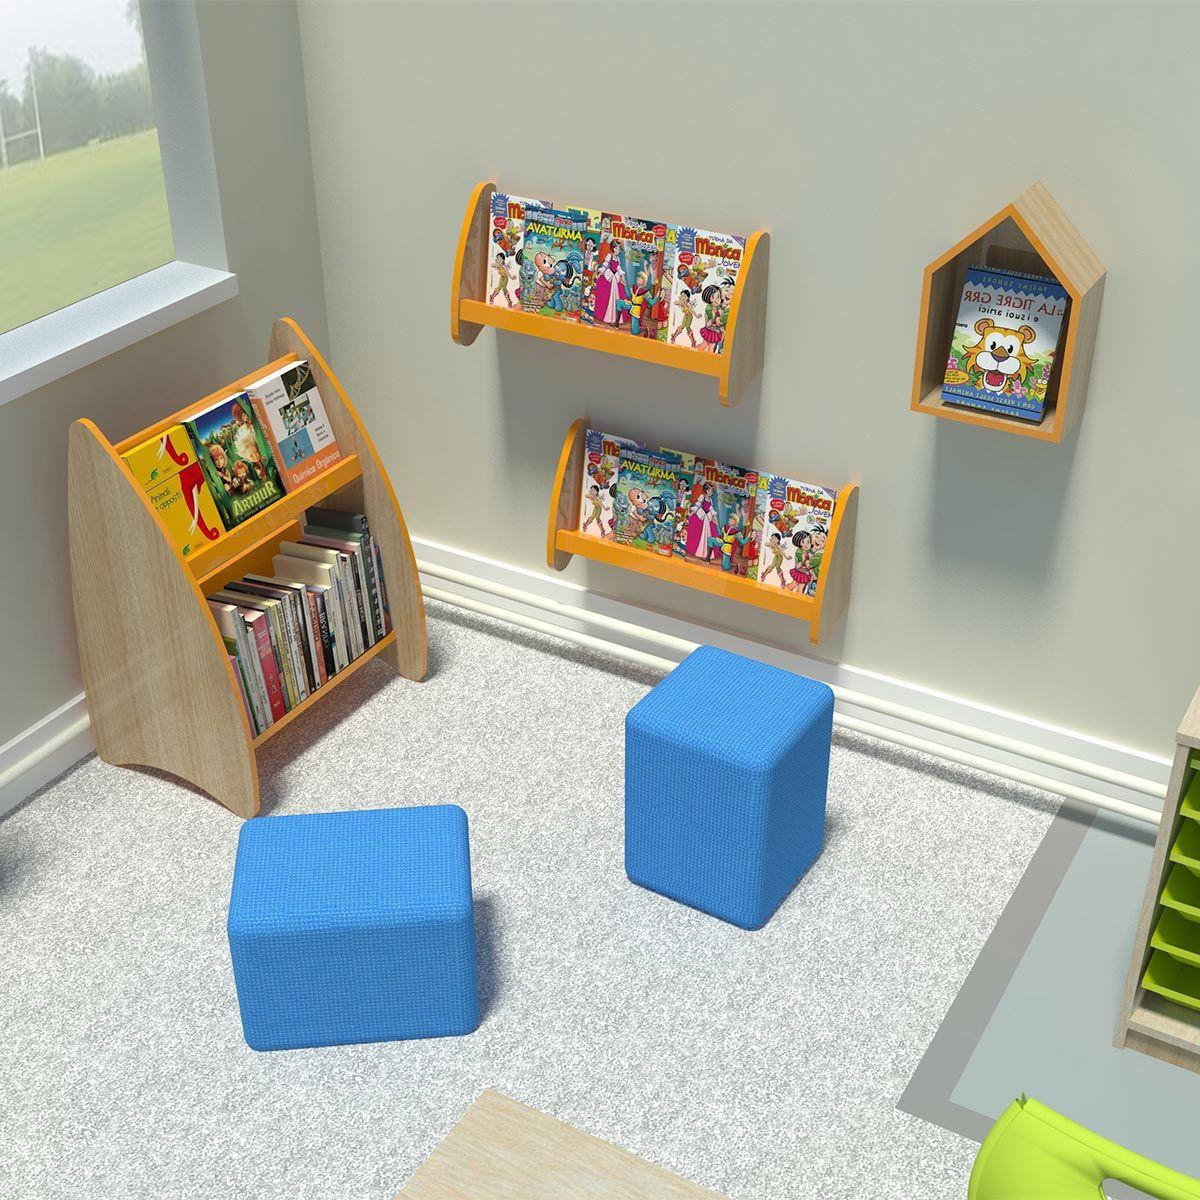 Reading Corner Furniture - Frasesdeconquista.com